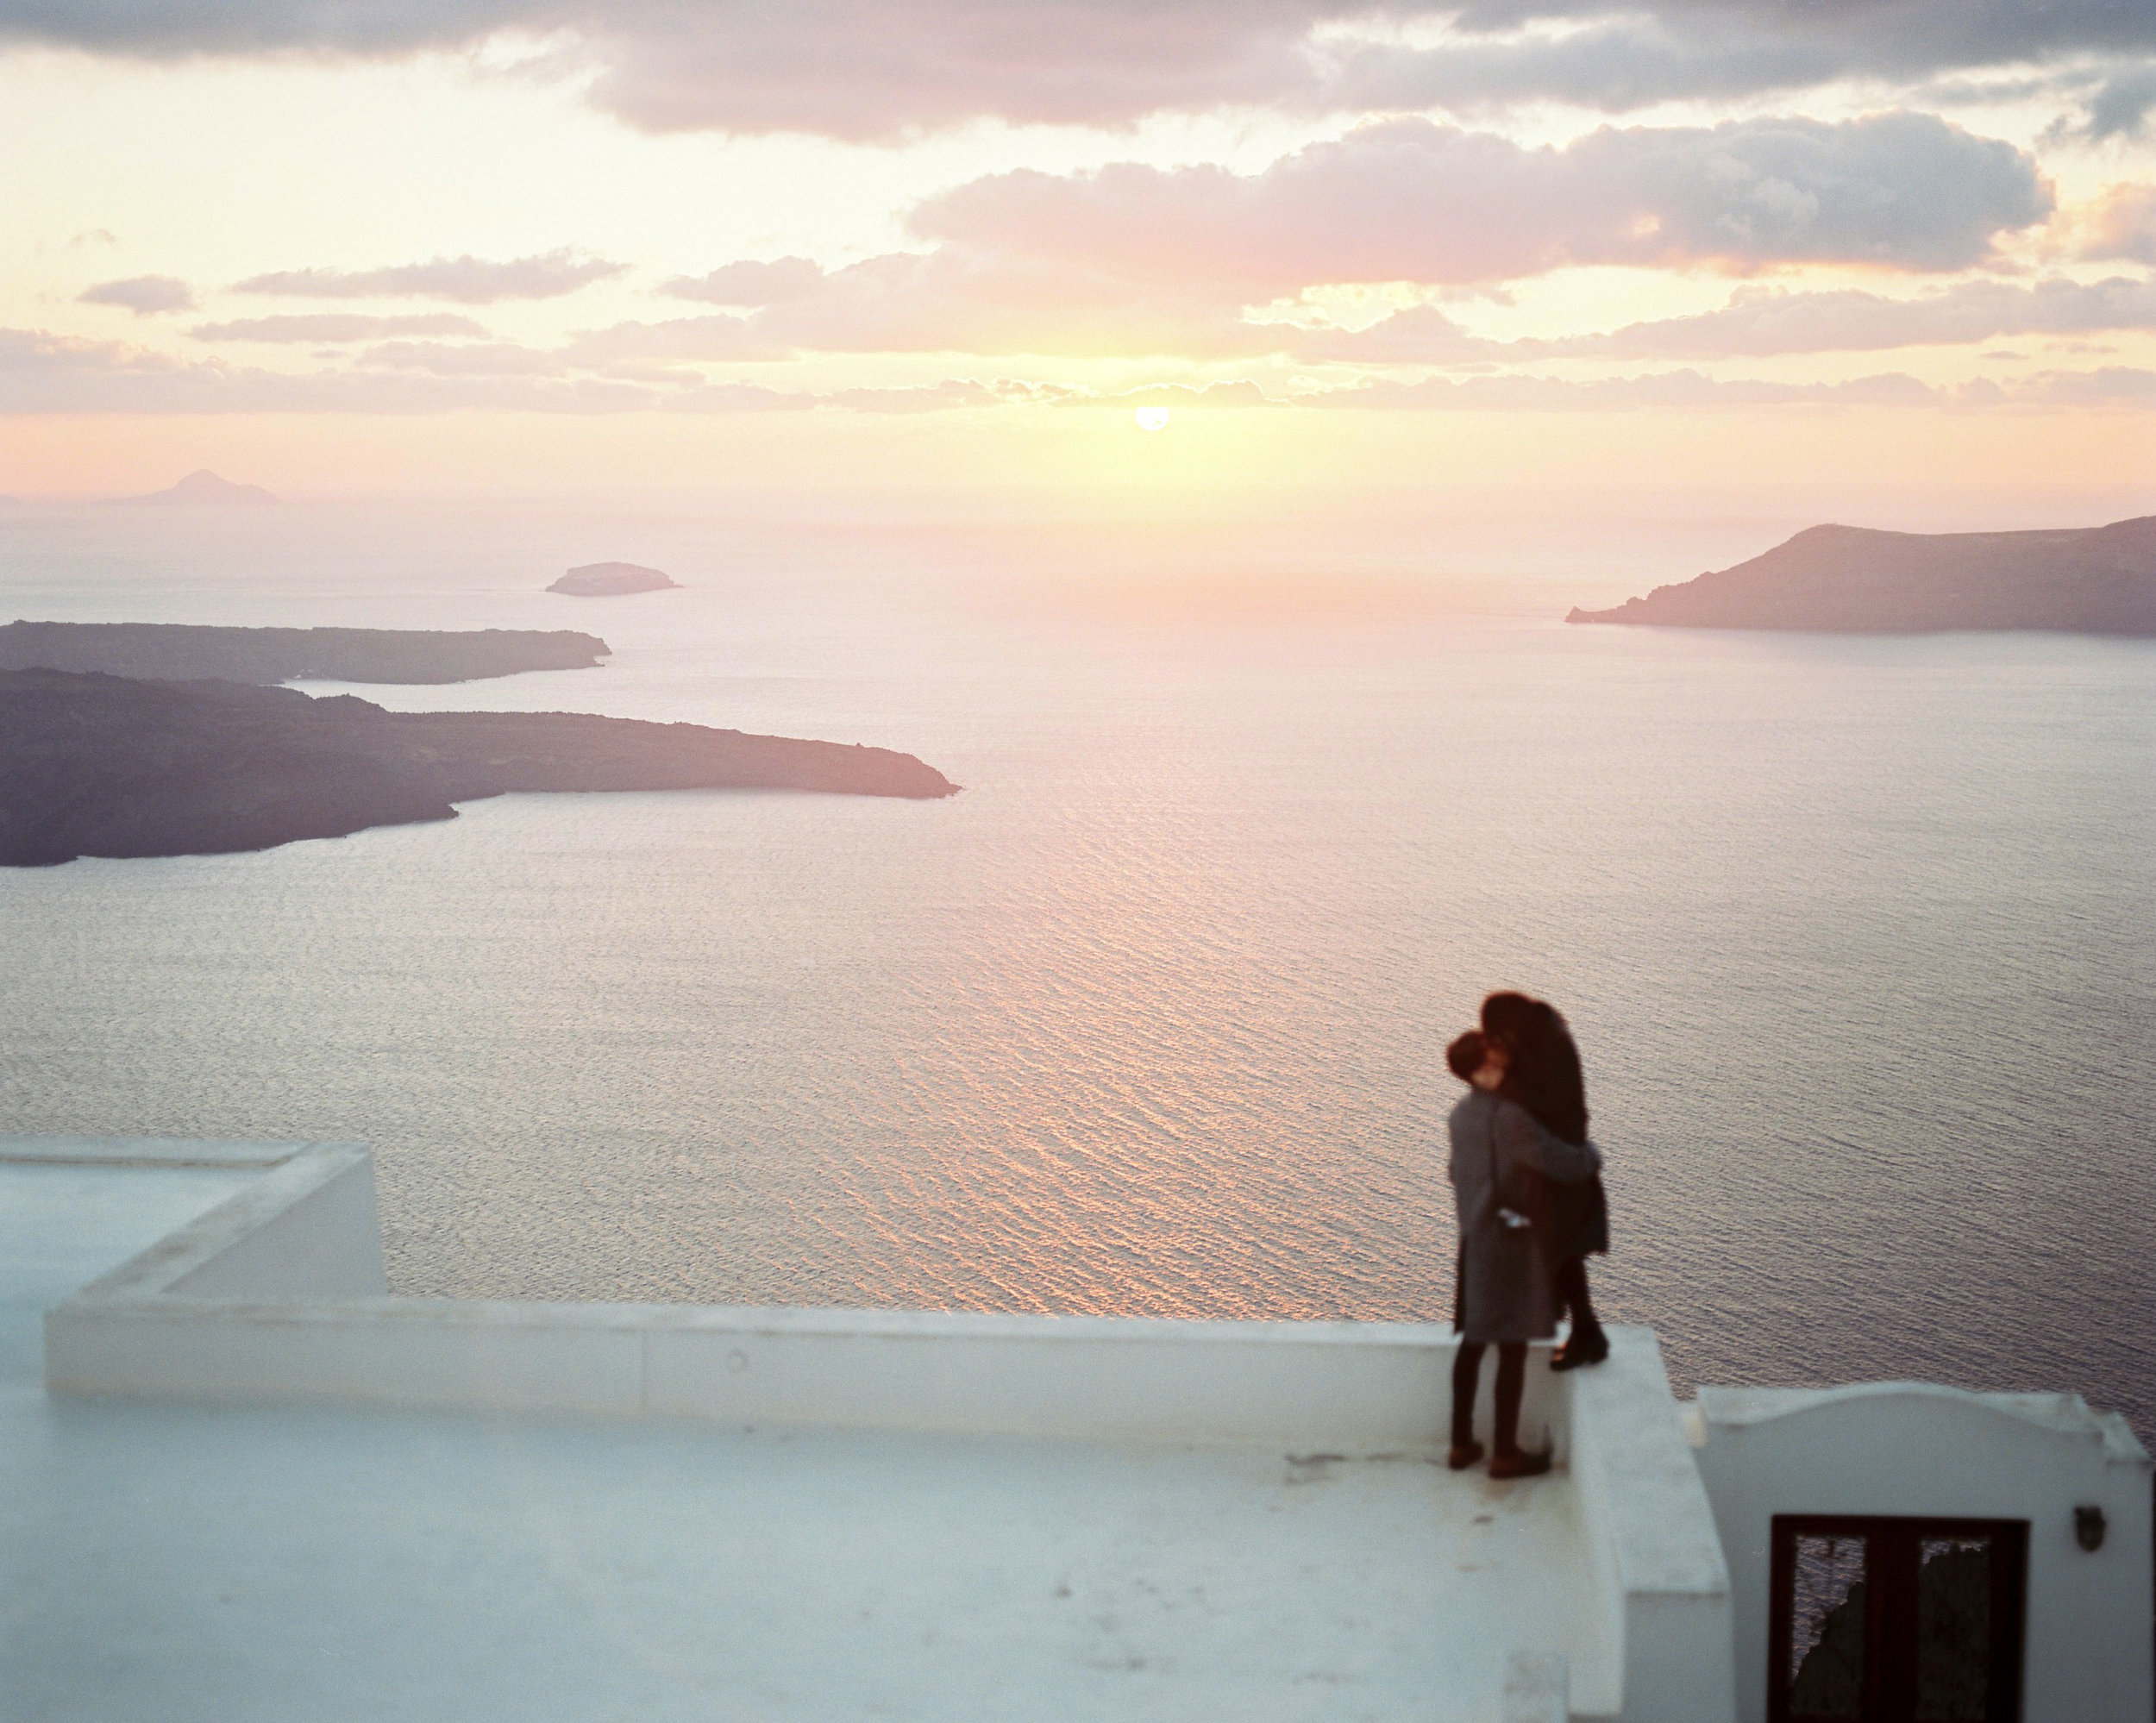 celinehamelin-photographe-couple-argentique-loversession-grece-santorin-argentique-filmphotography-greece19.jpg